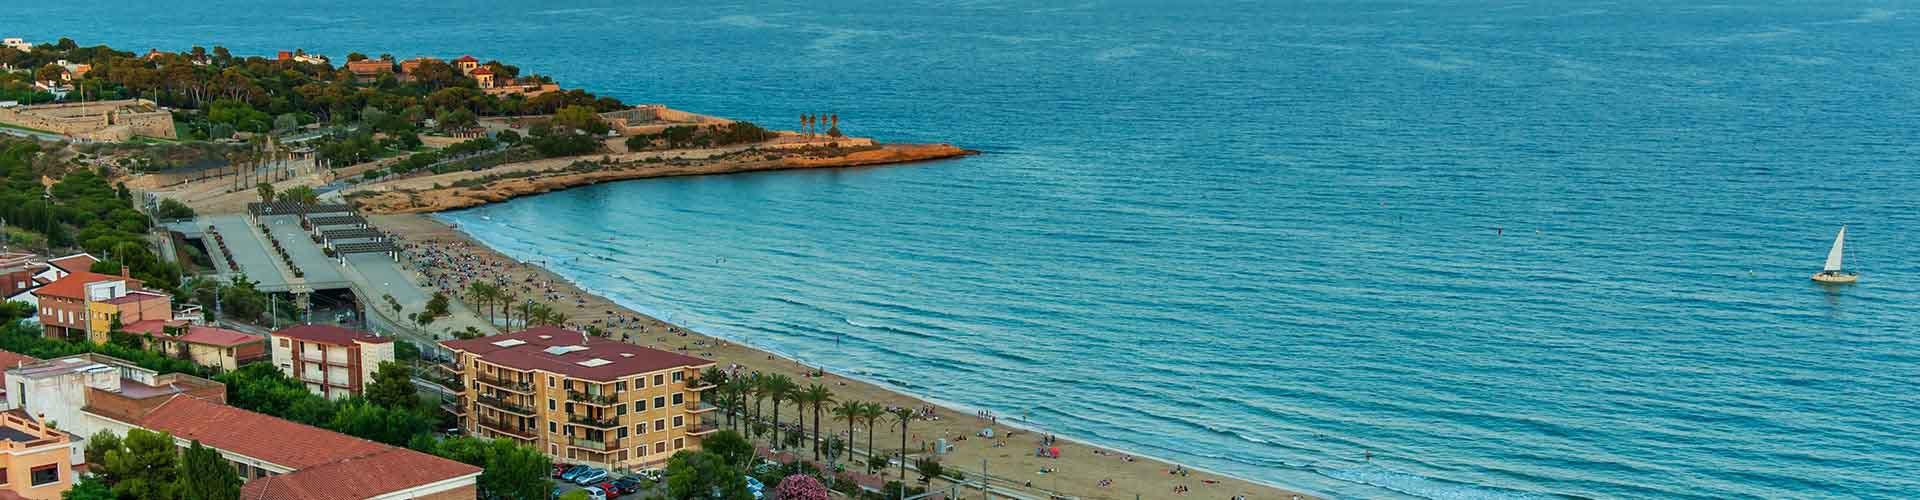 popular árabe flaco en Tarragona